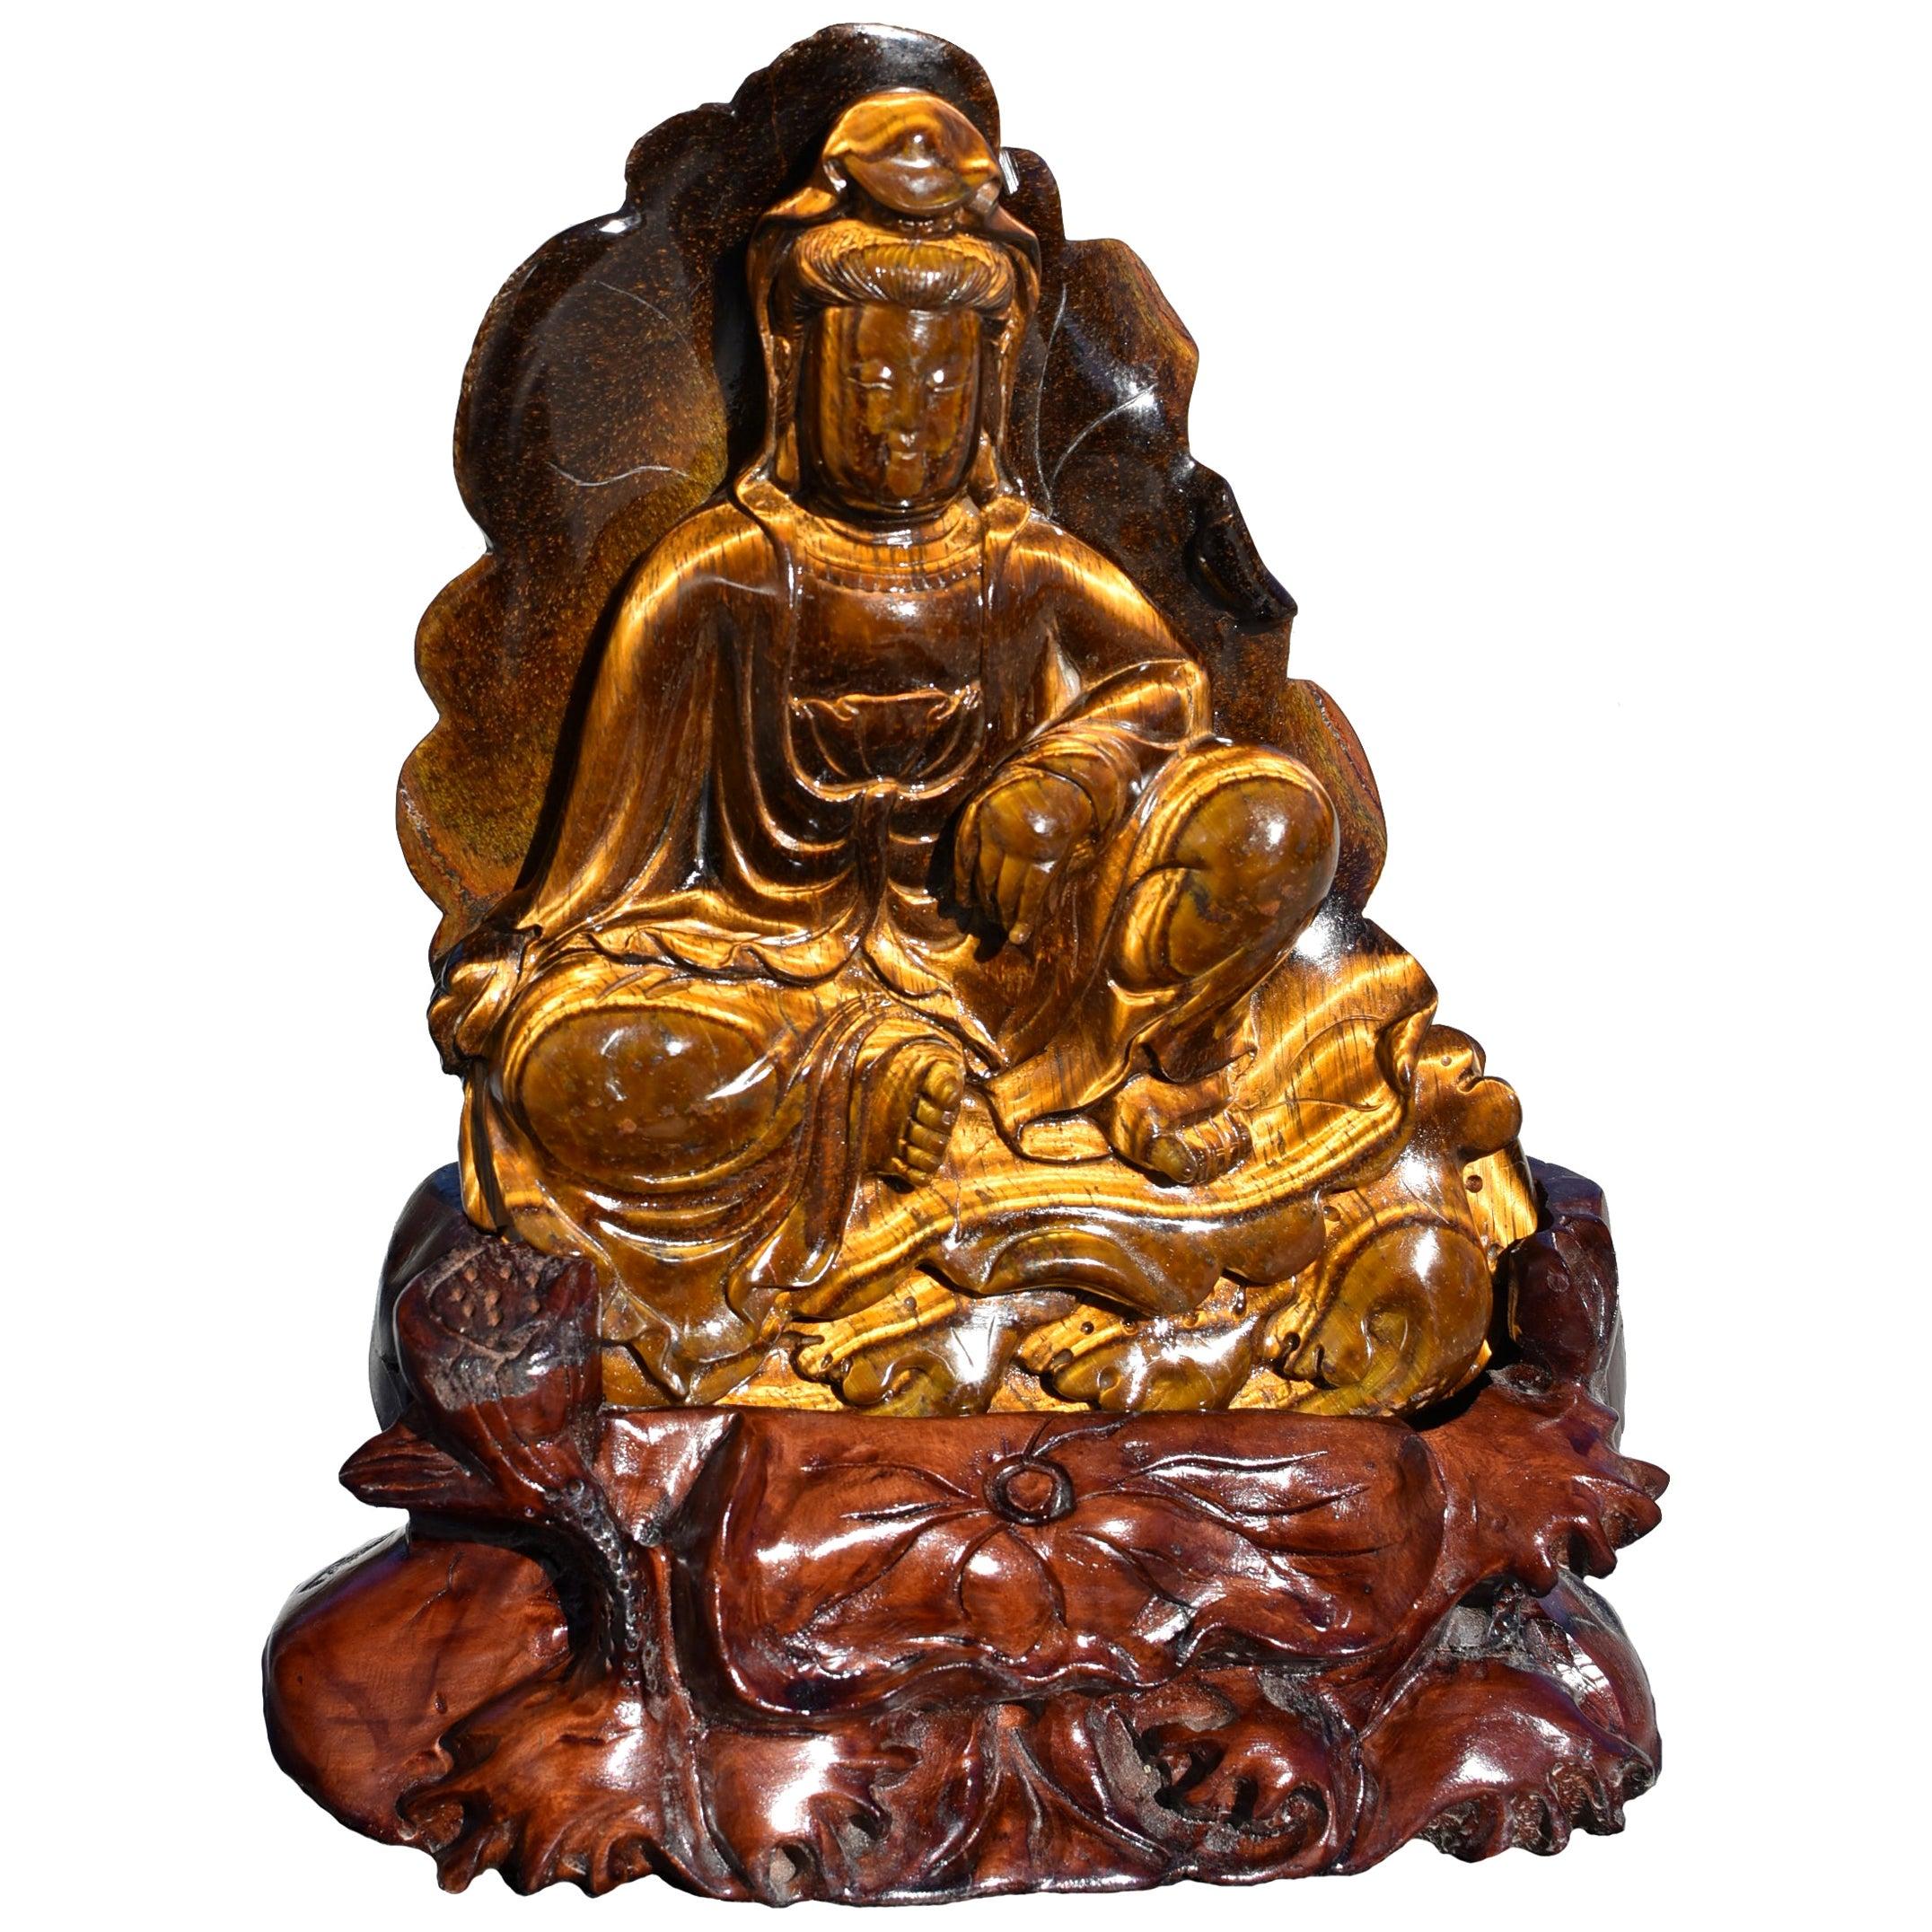 Tiger's Eye Water Moon Guan Yin Avalokiteshvara Statue